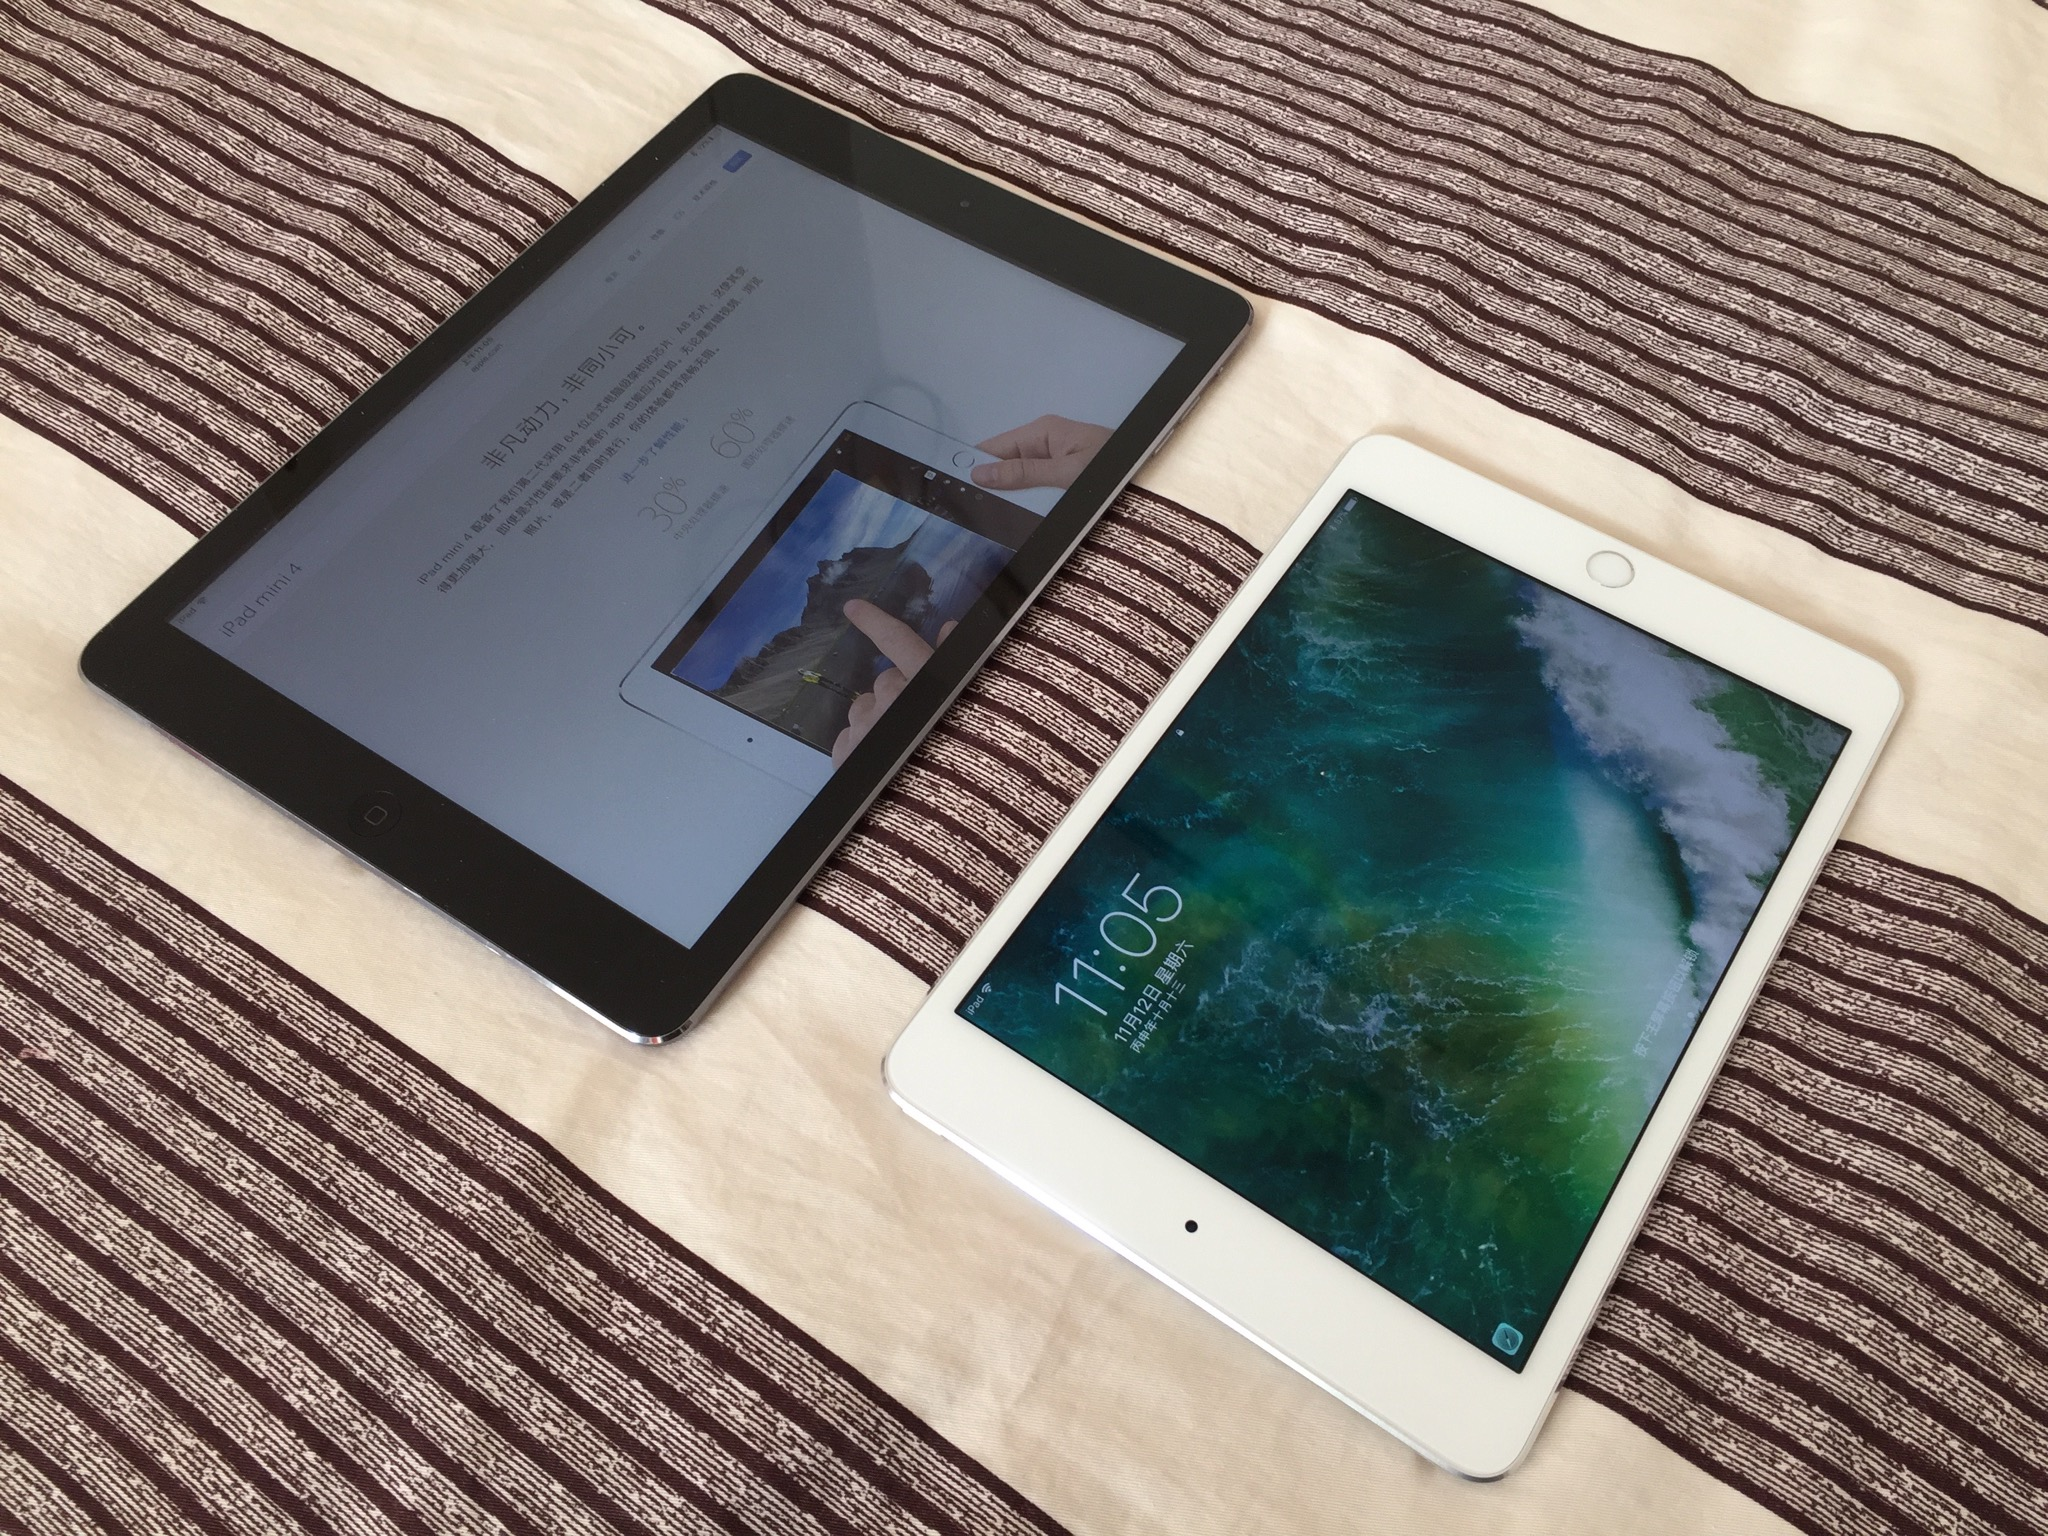 iPad mini4 vs iPad Air